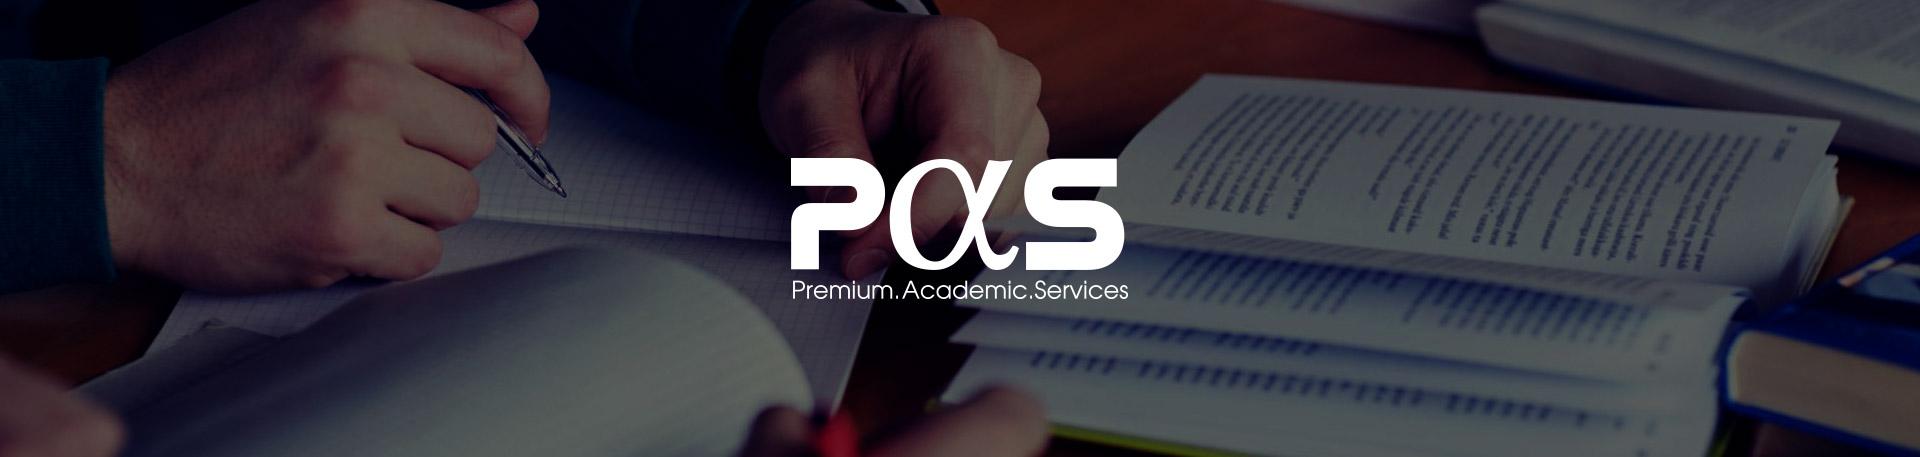 pasacademics cover